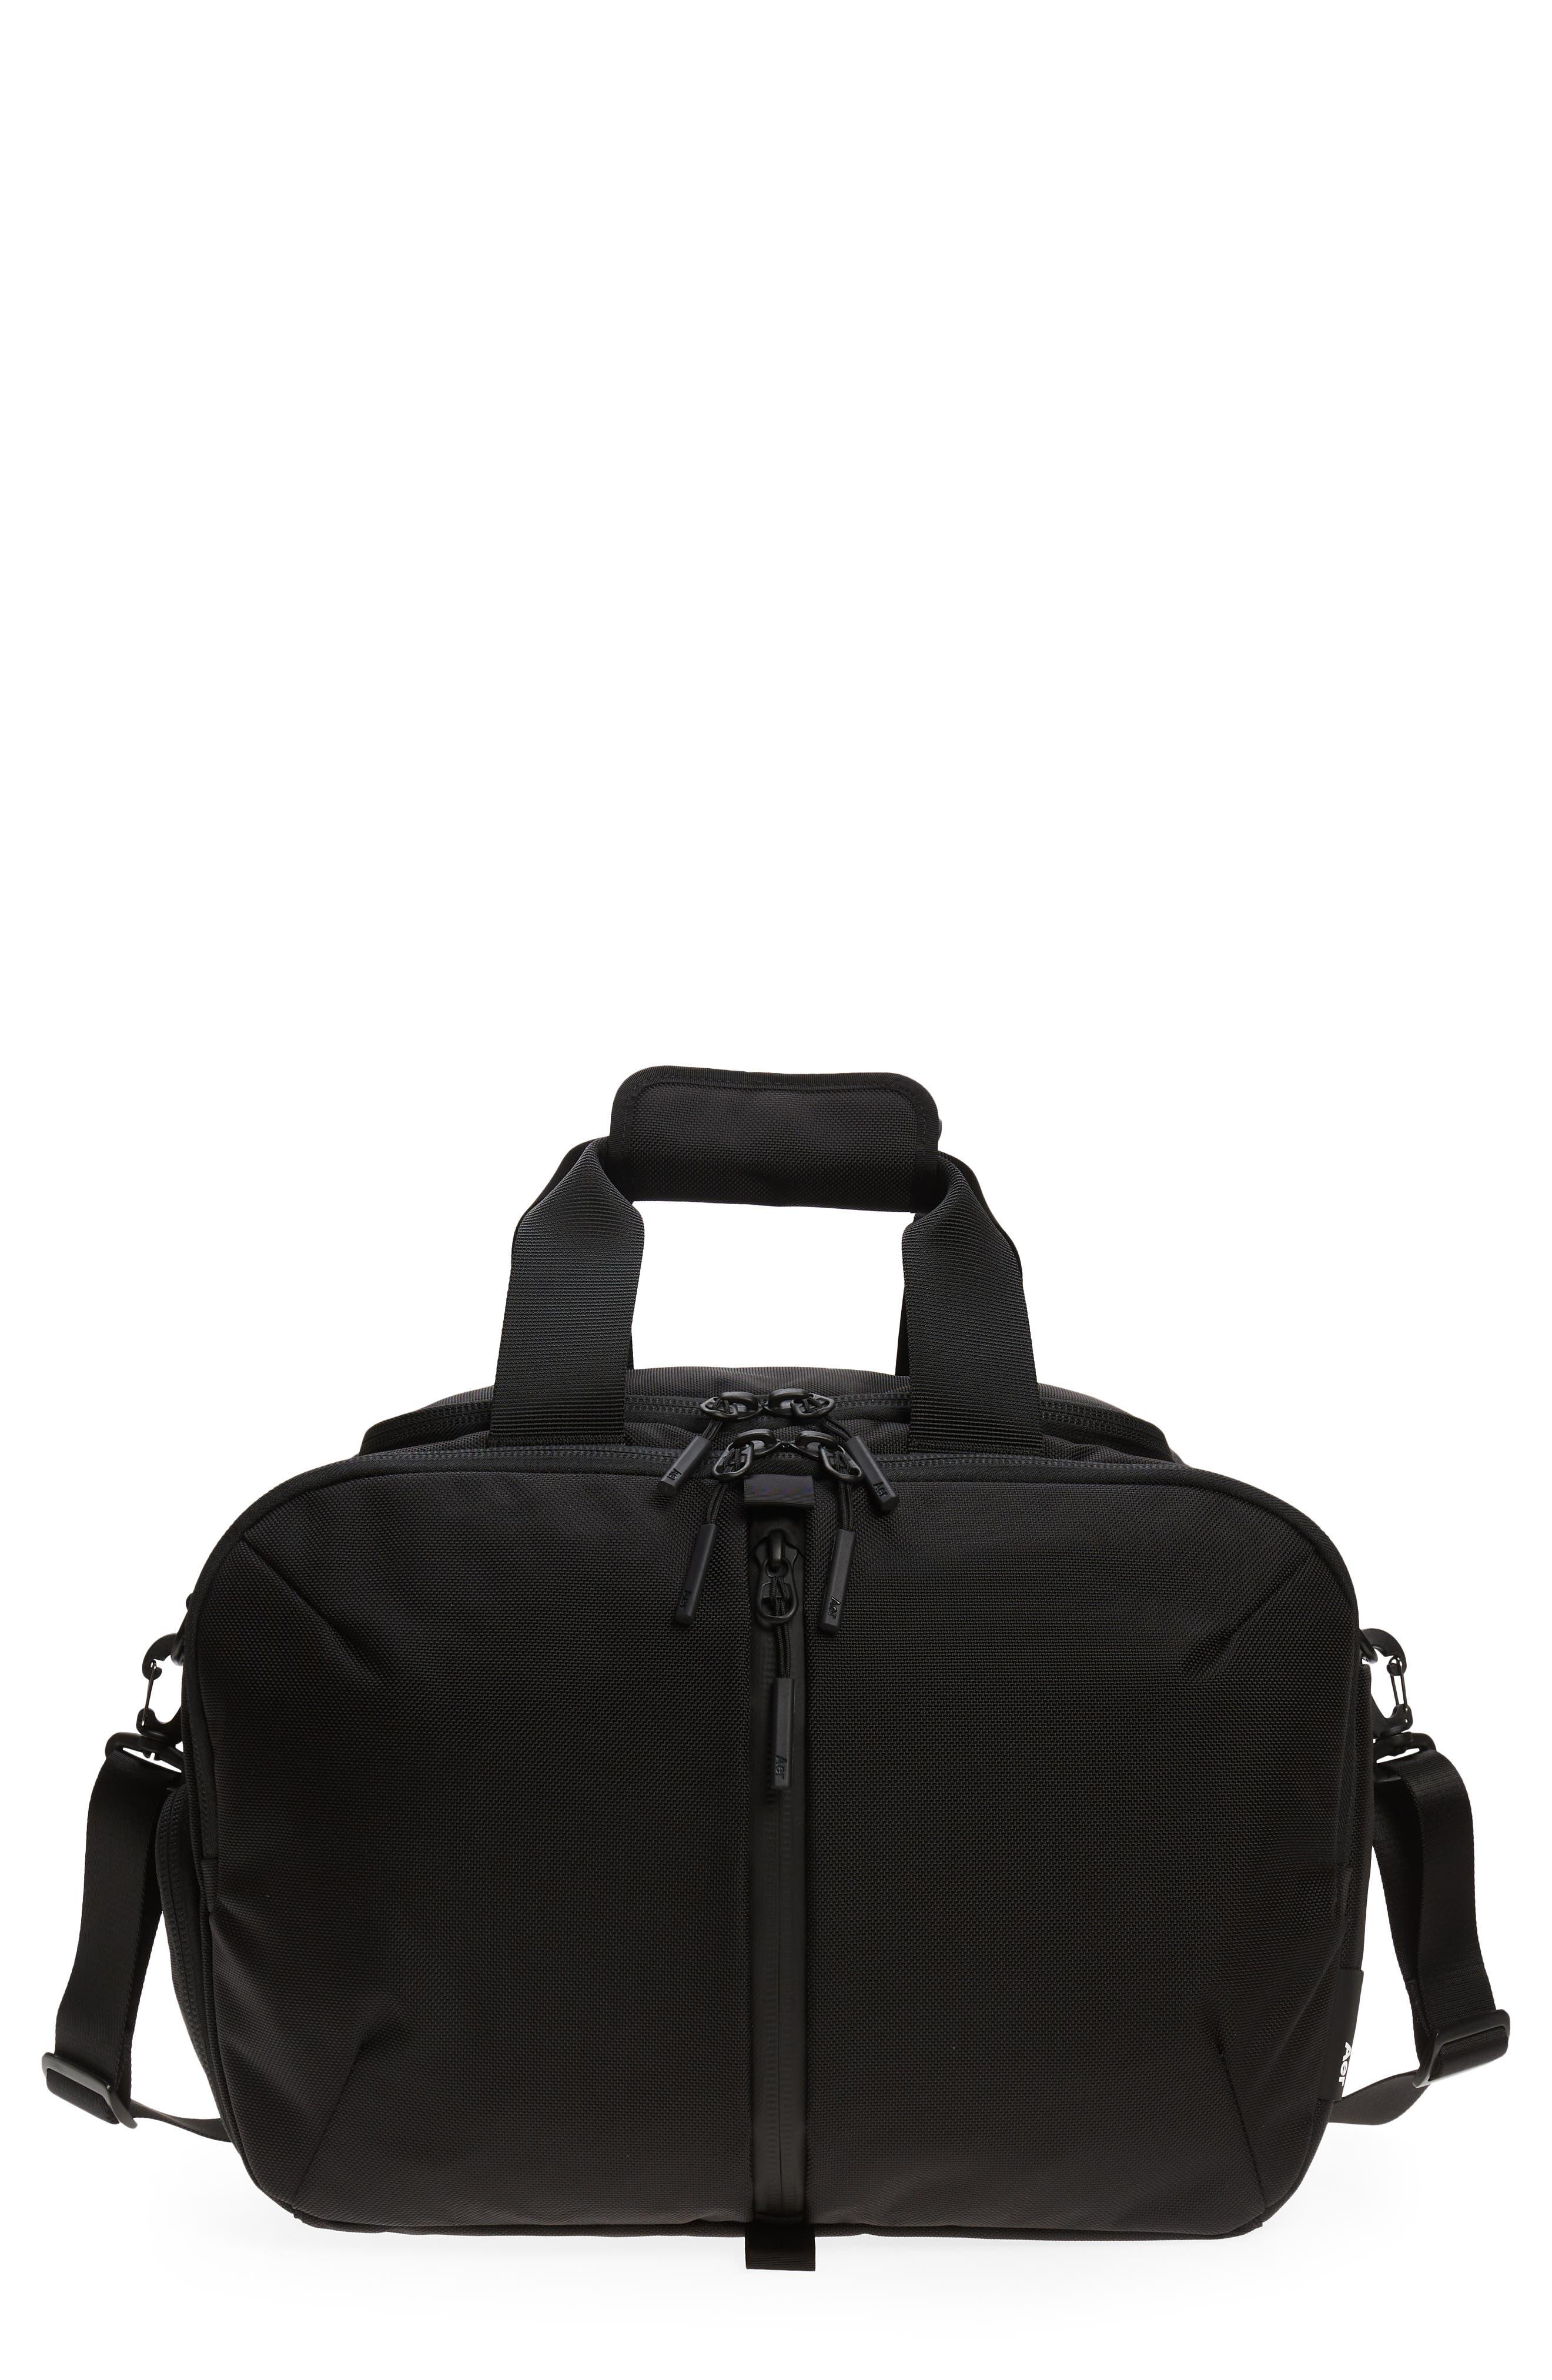 Water Resistant Nylon Gym Duffle Bag